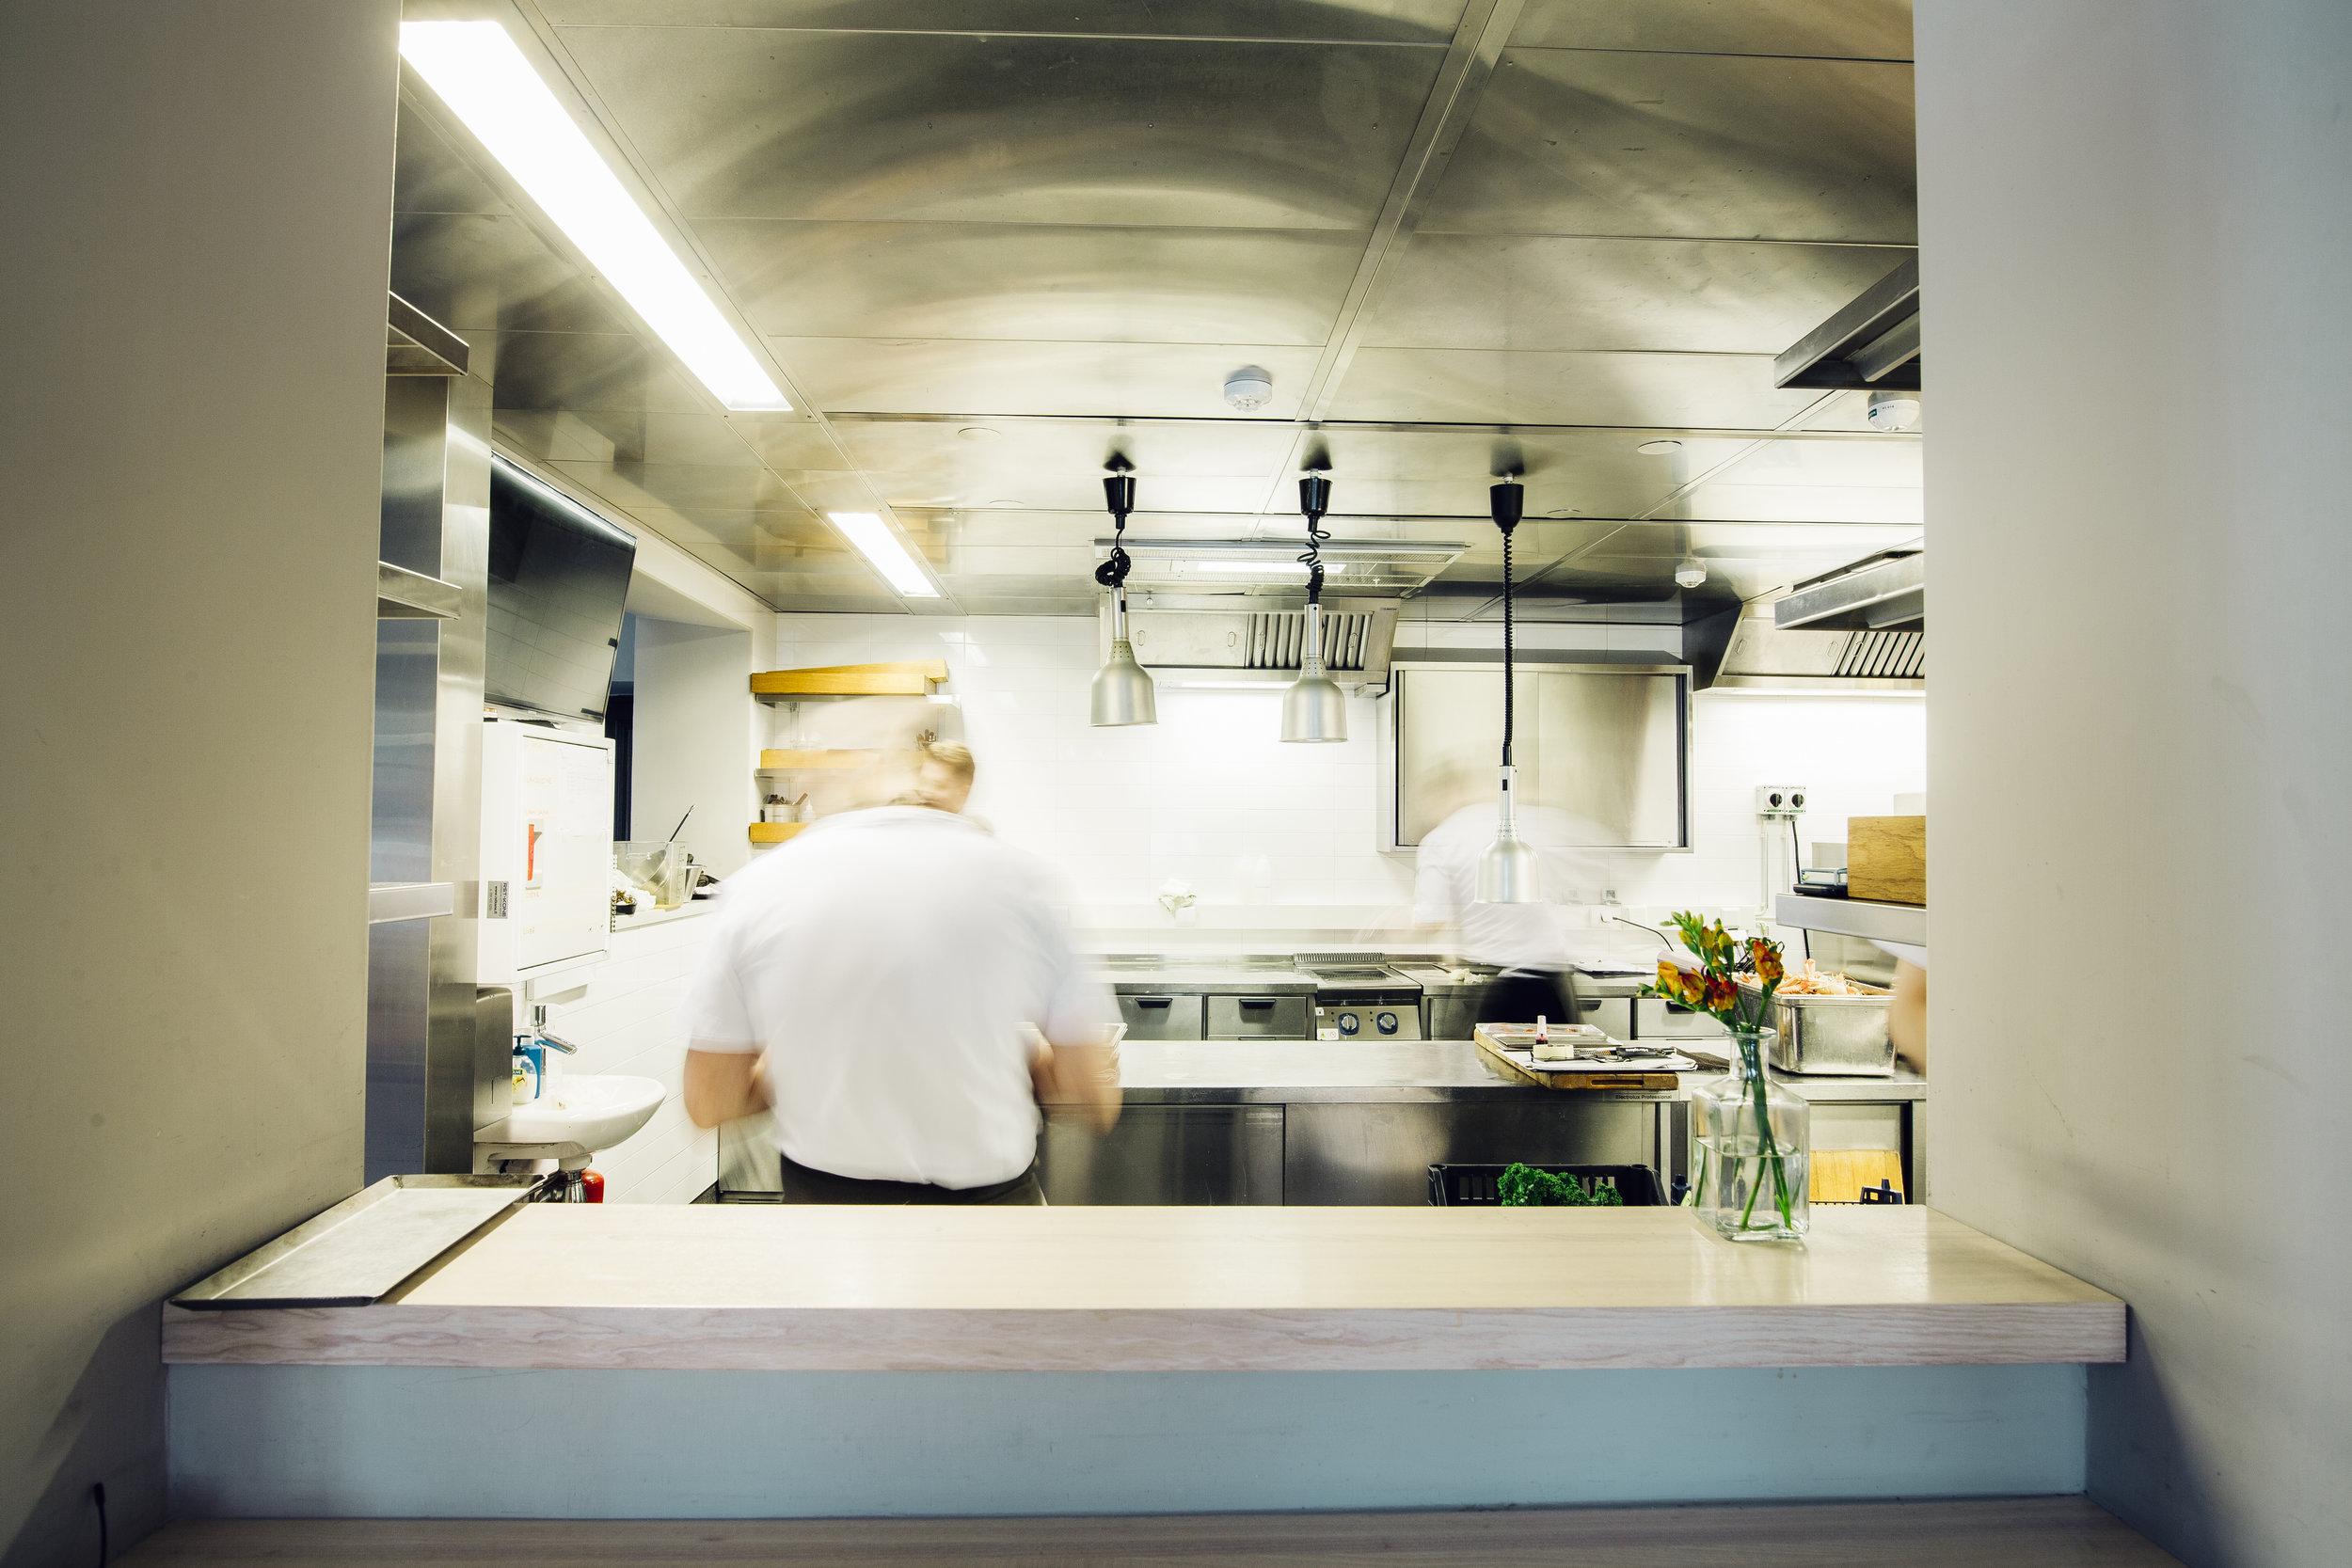 Restaurant Olo interrior